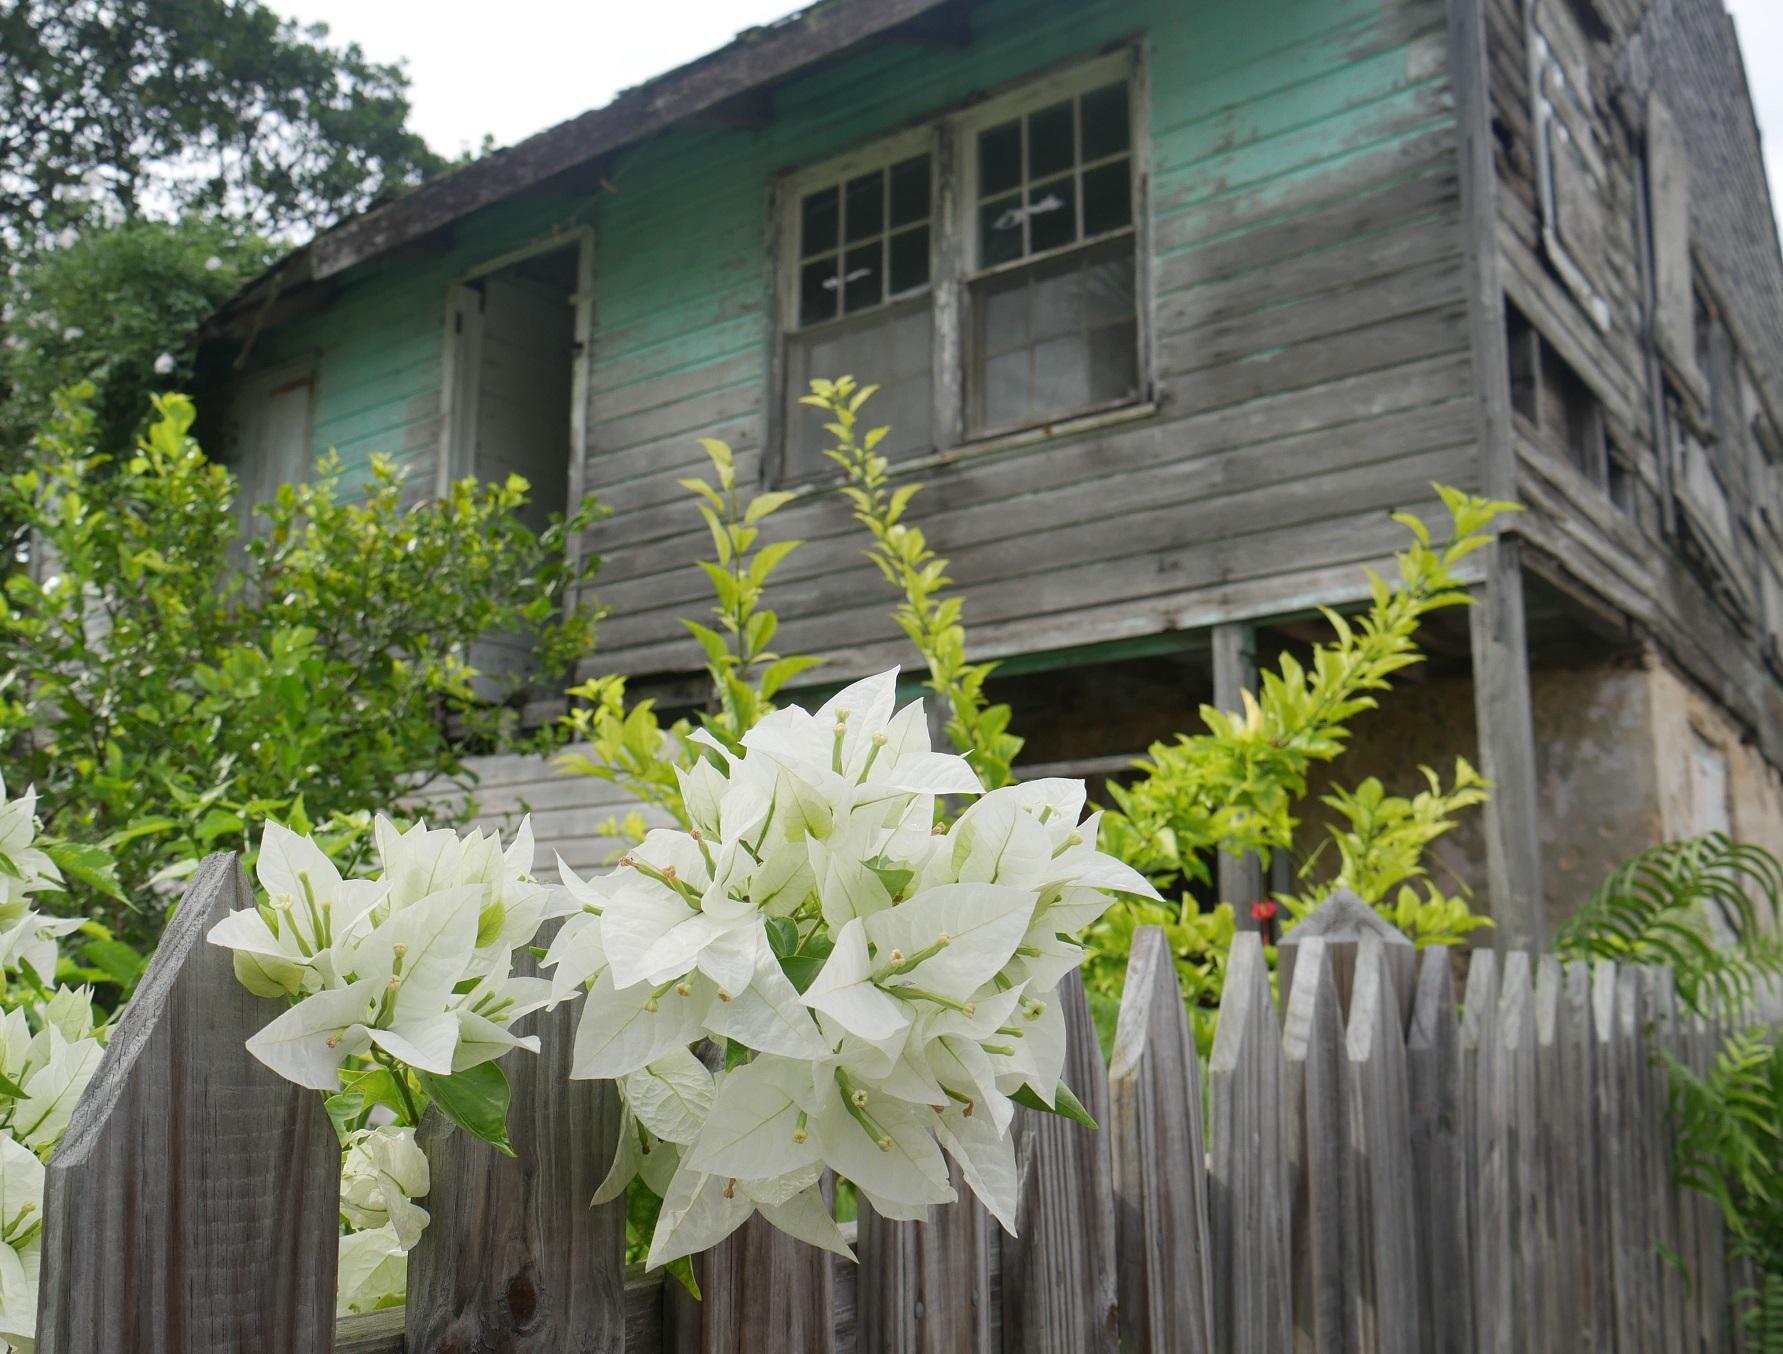 The Kendrick House - Green Turtle Cay, Abaco, Bahamas